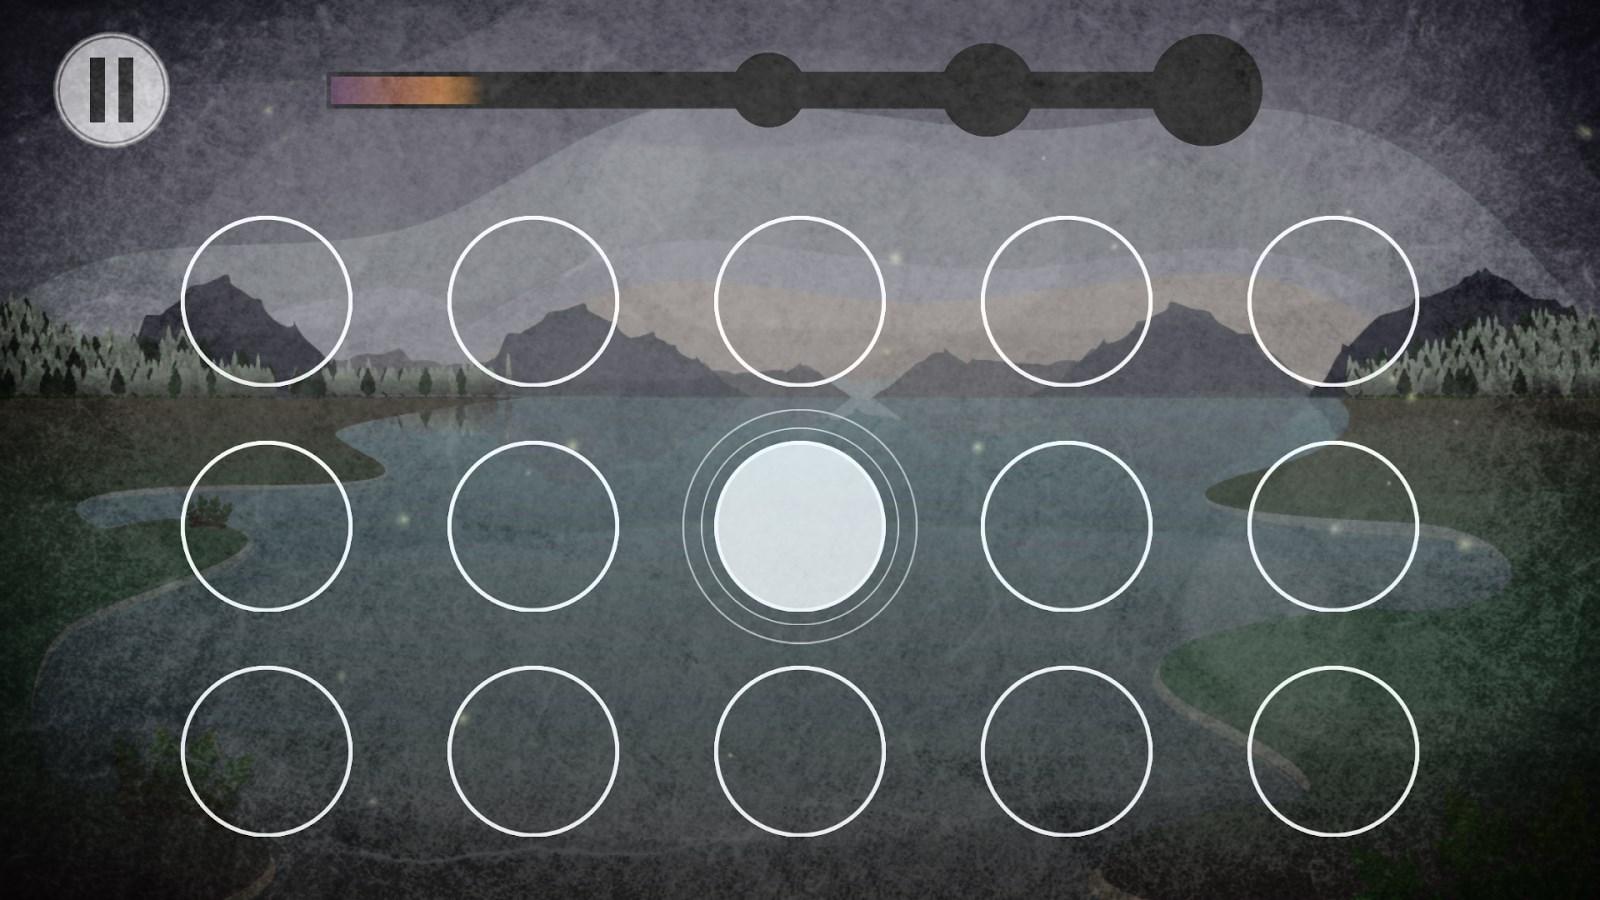 HiLight : Touch the light ! - Imagem 1 do software